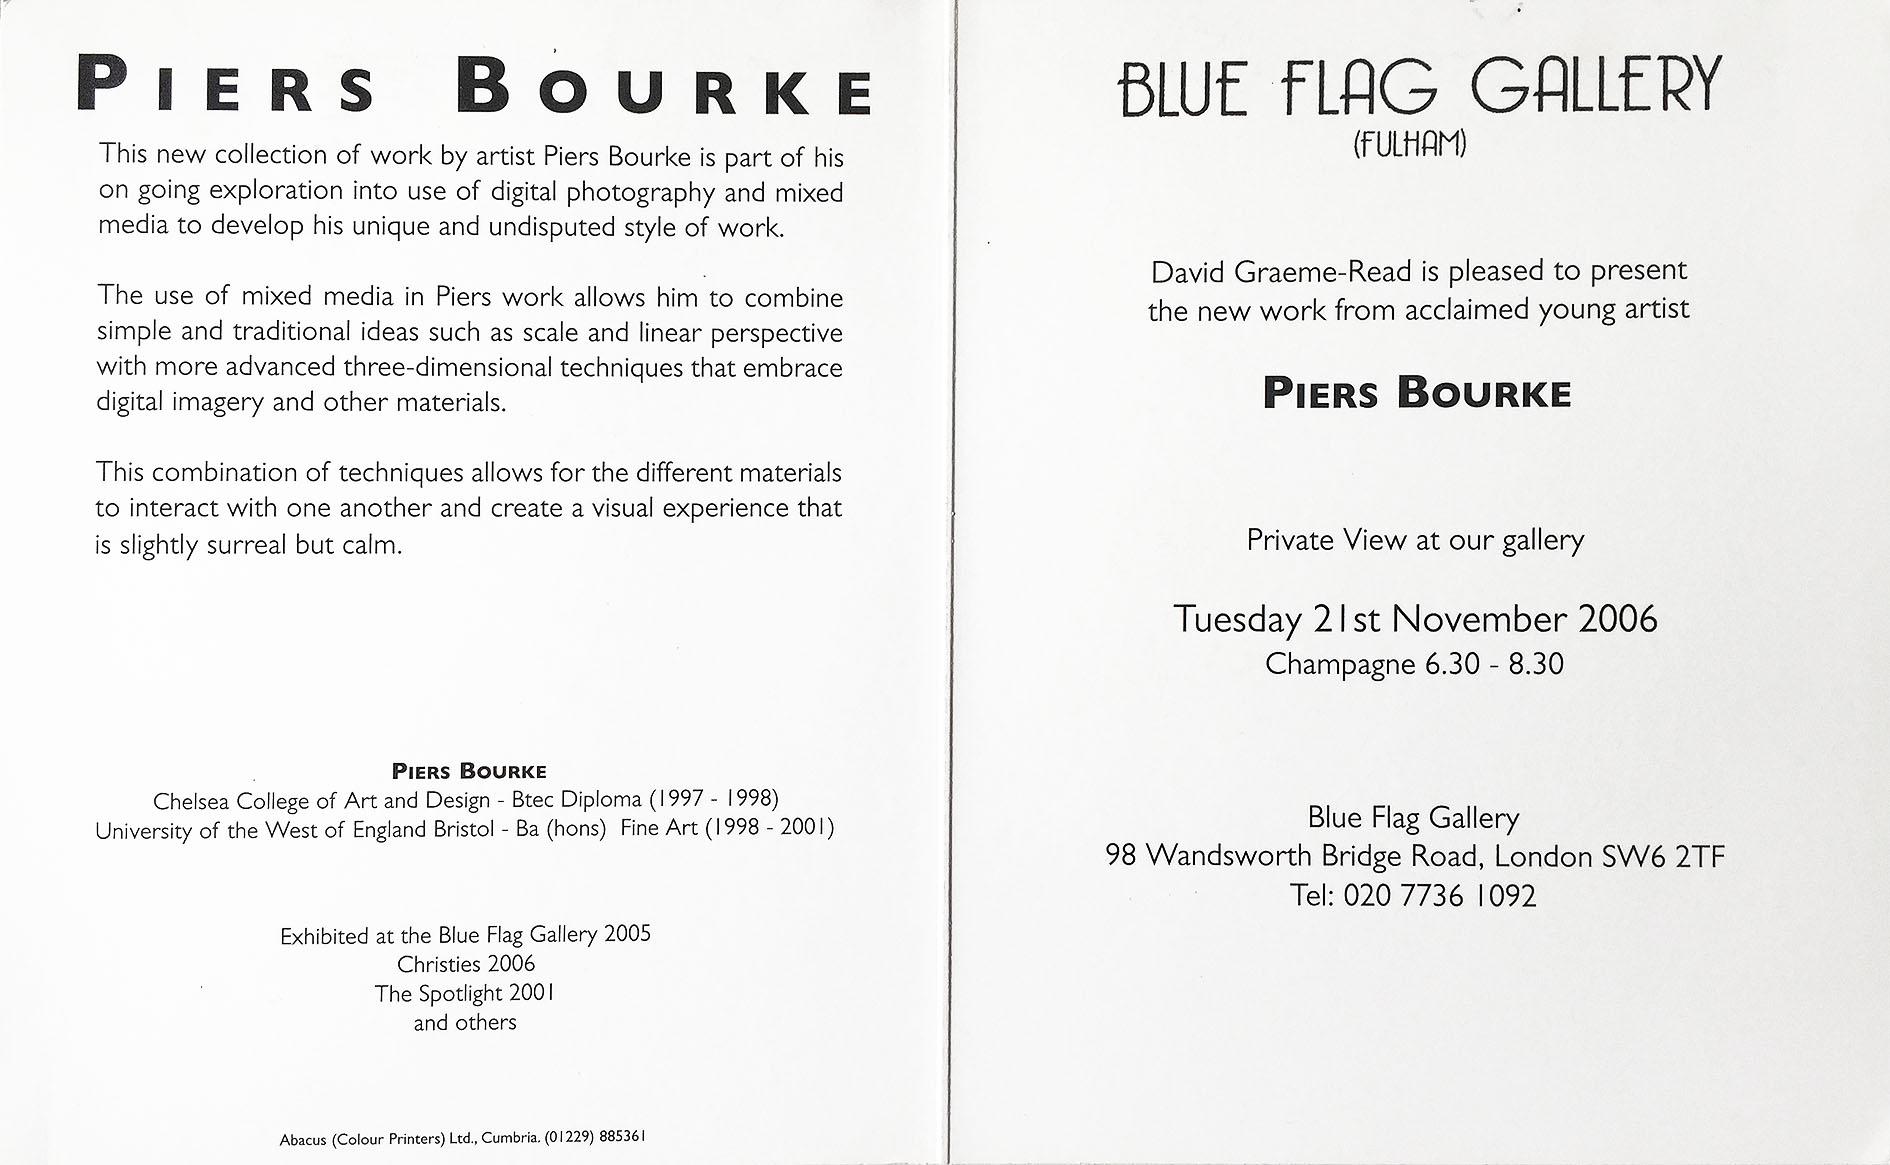 Blue Flag Gallery